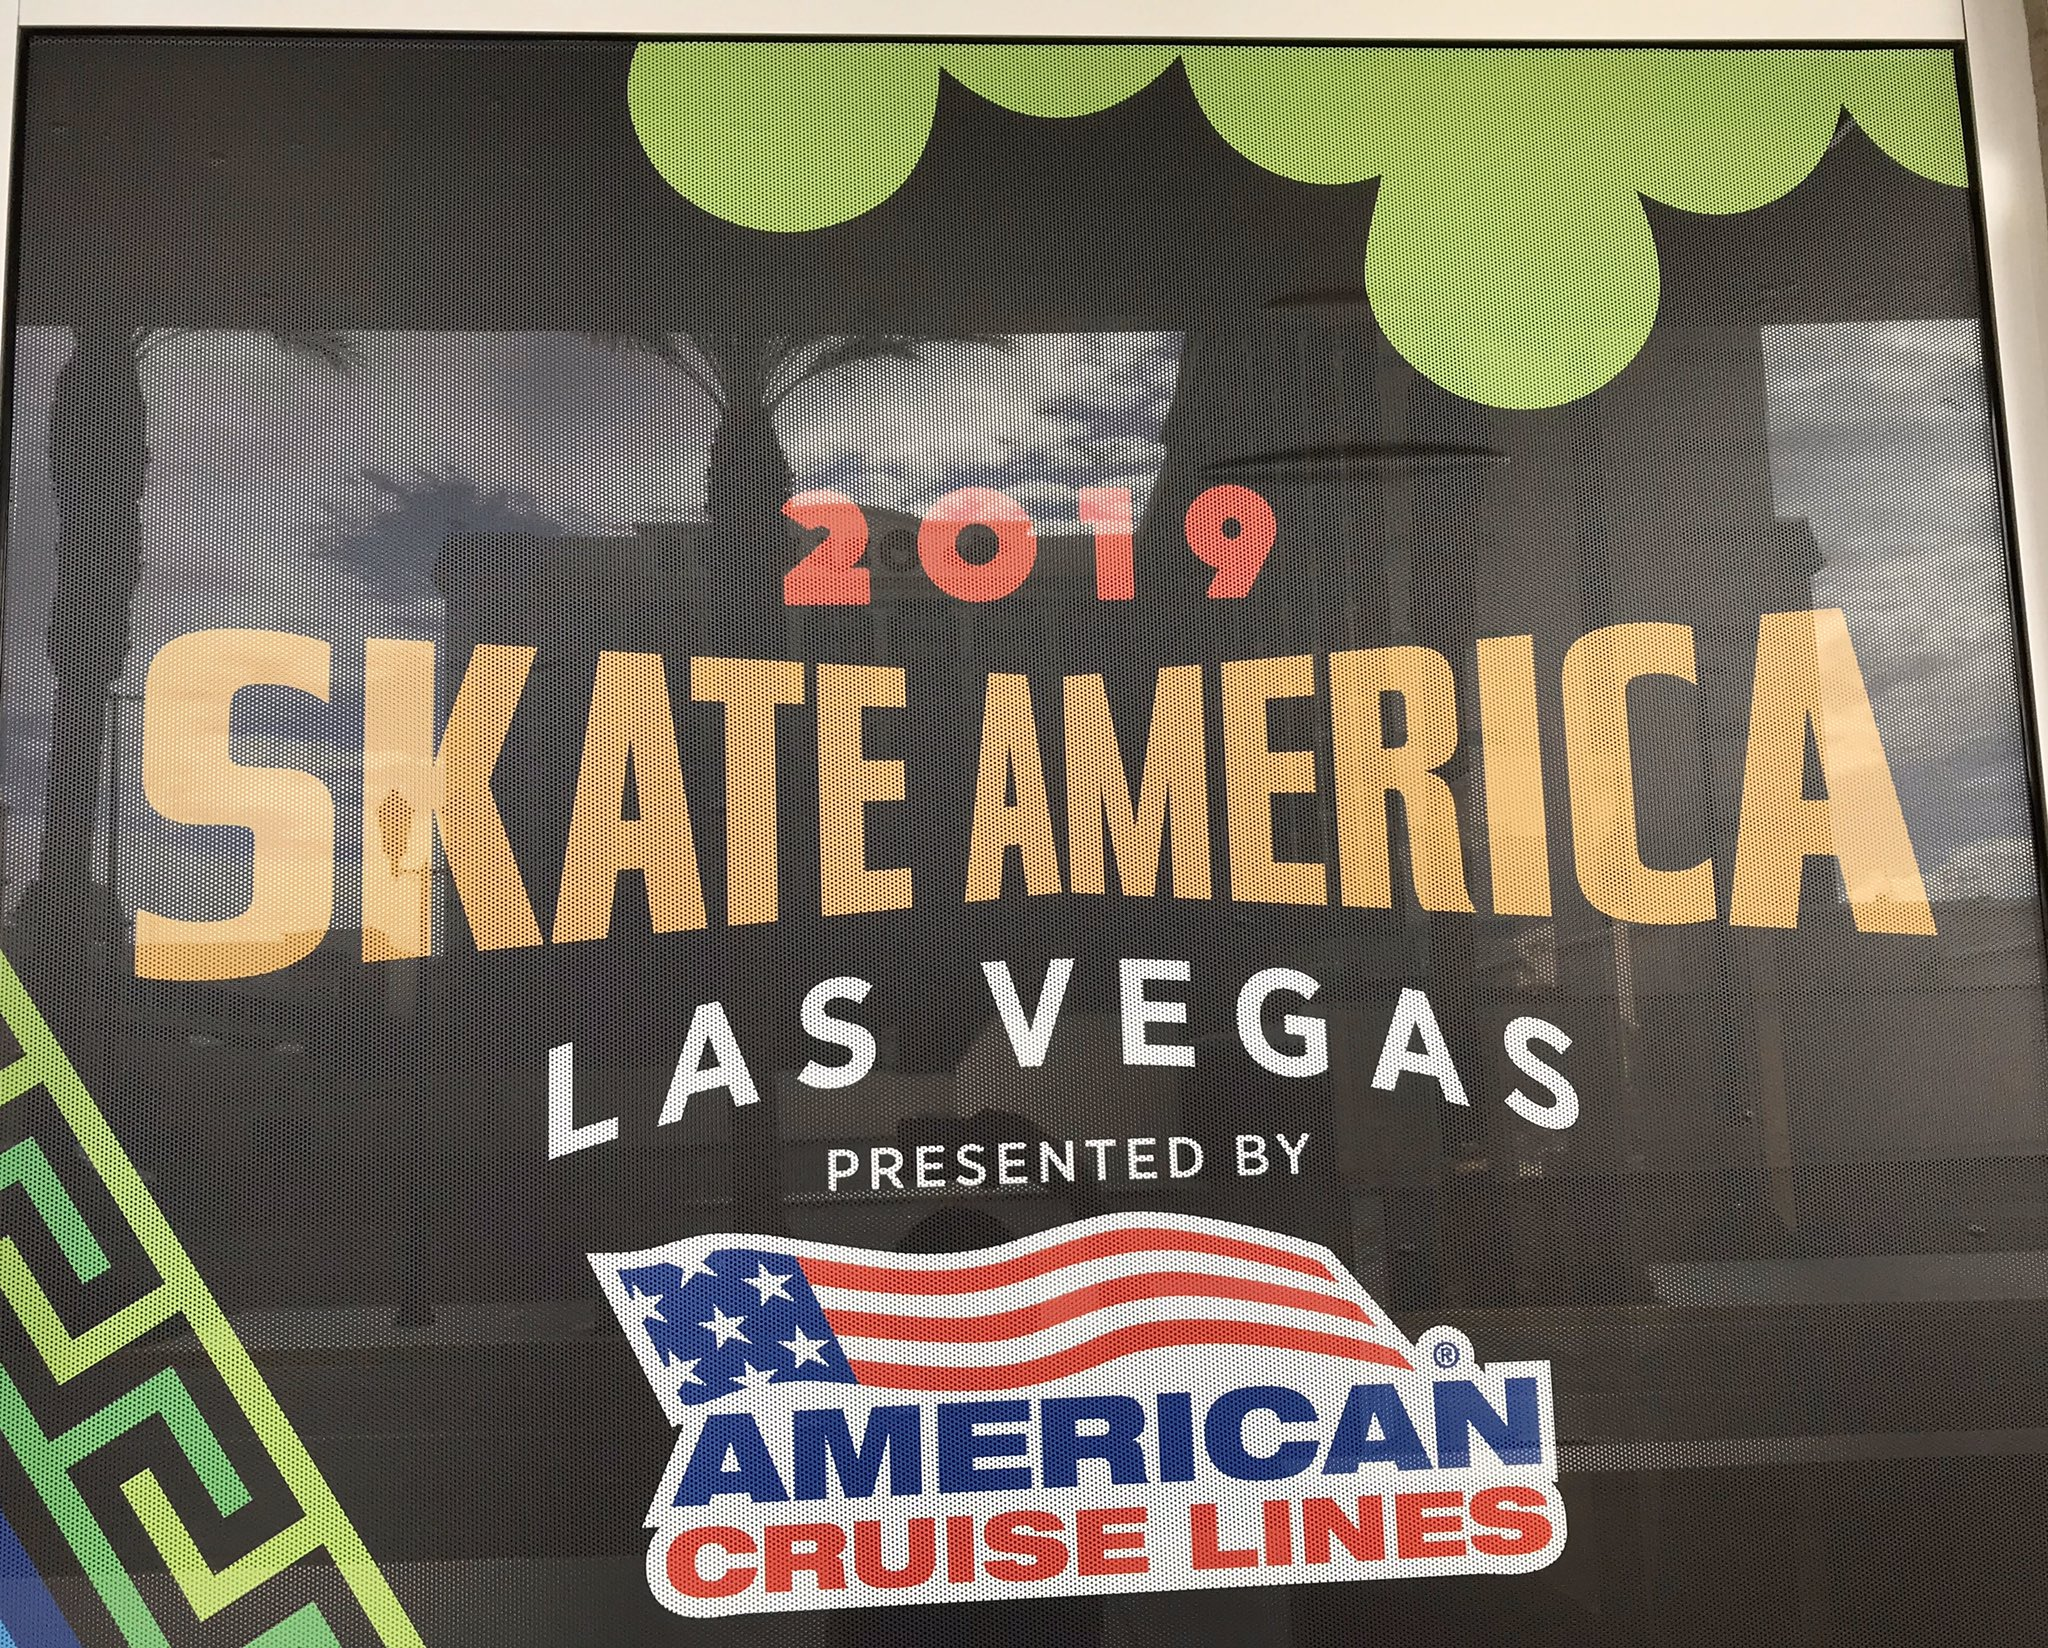 GP - 1 этап. Skate America Las Vegas, NV / USA October 18-20, 2019   - Страница 3 EHI4fPkWkAAyOGJ?format=jpg&name=4096x4096